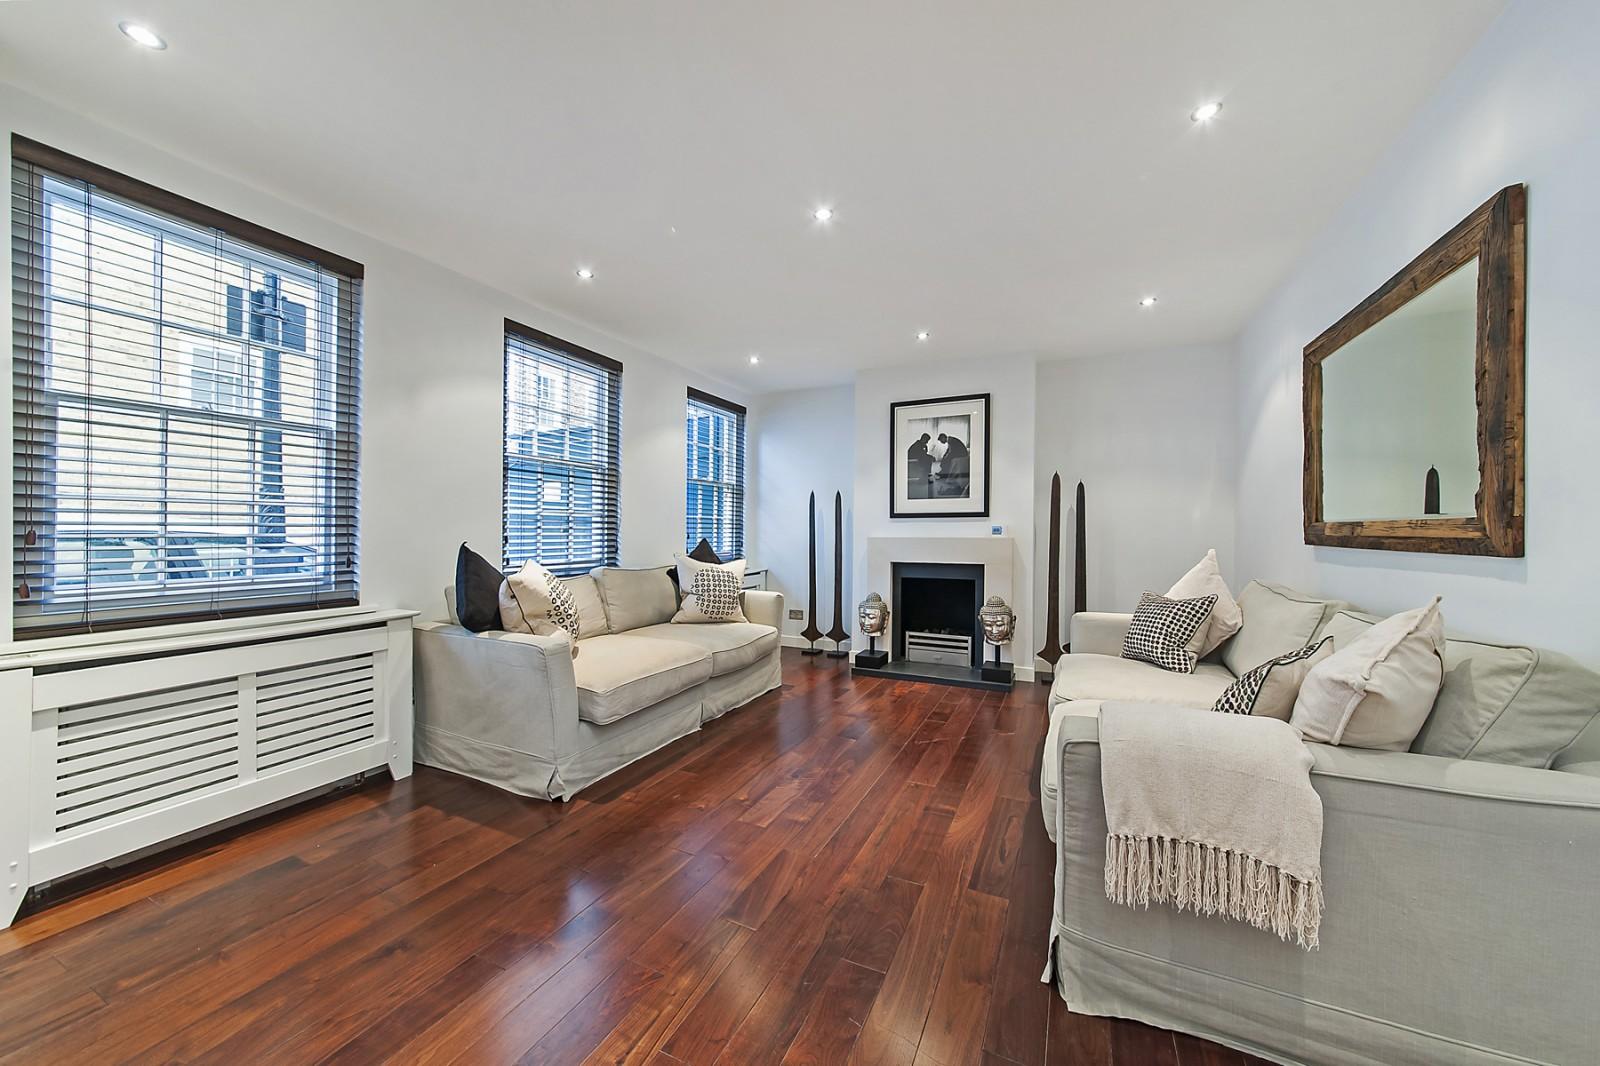 Maison unifamiliale pour l à louer à Rutland Street, Knightsbridge, London, SW7 Knightsbridge, London, Angleterre